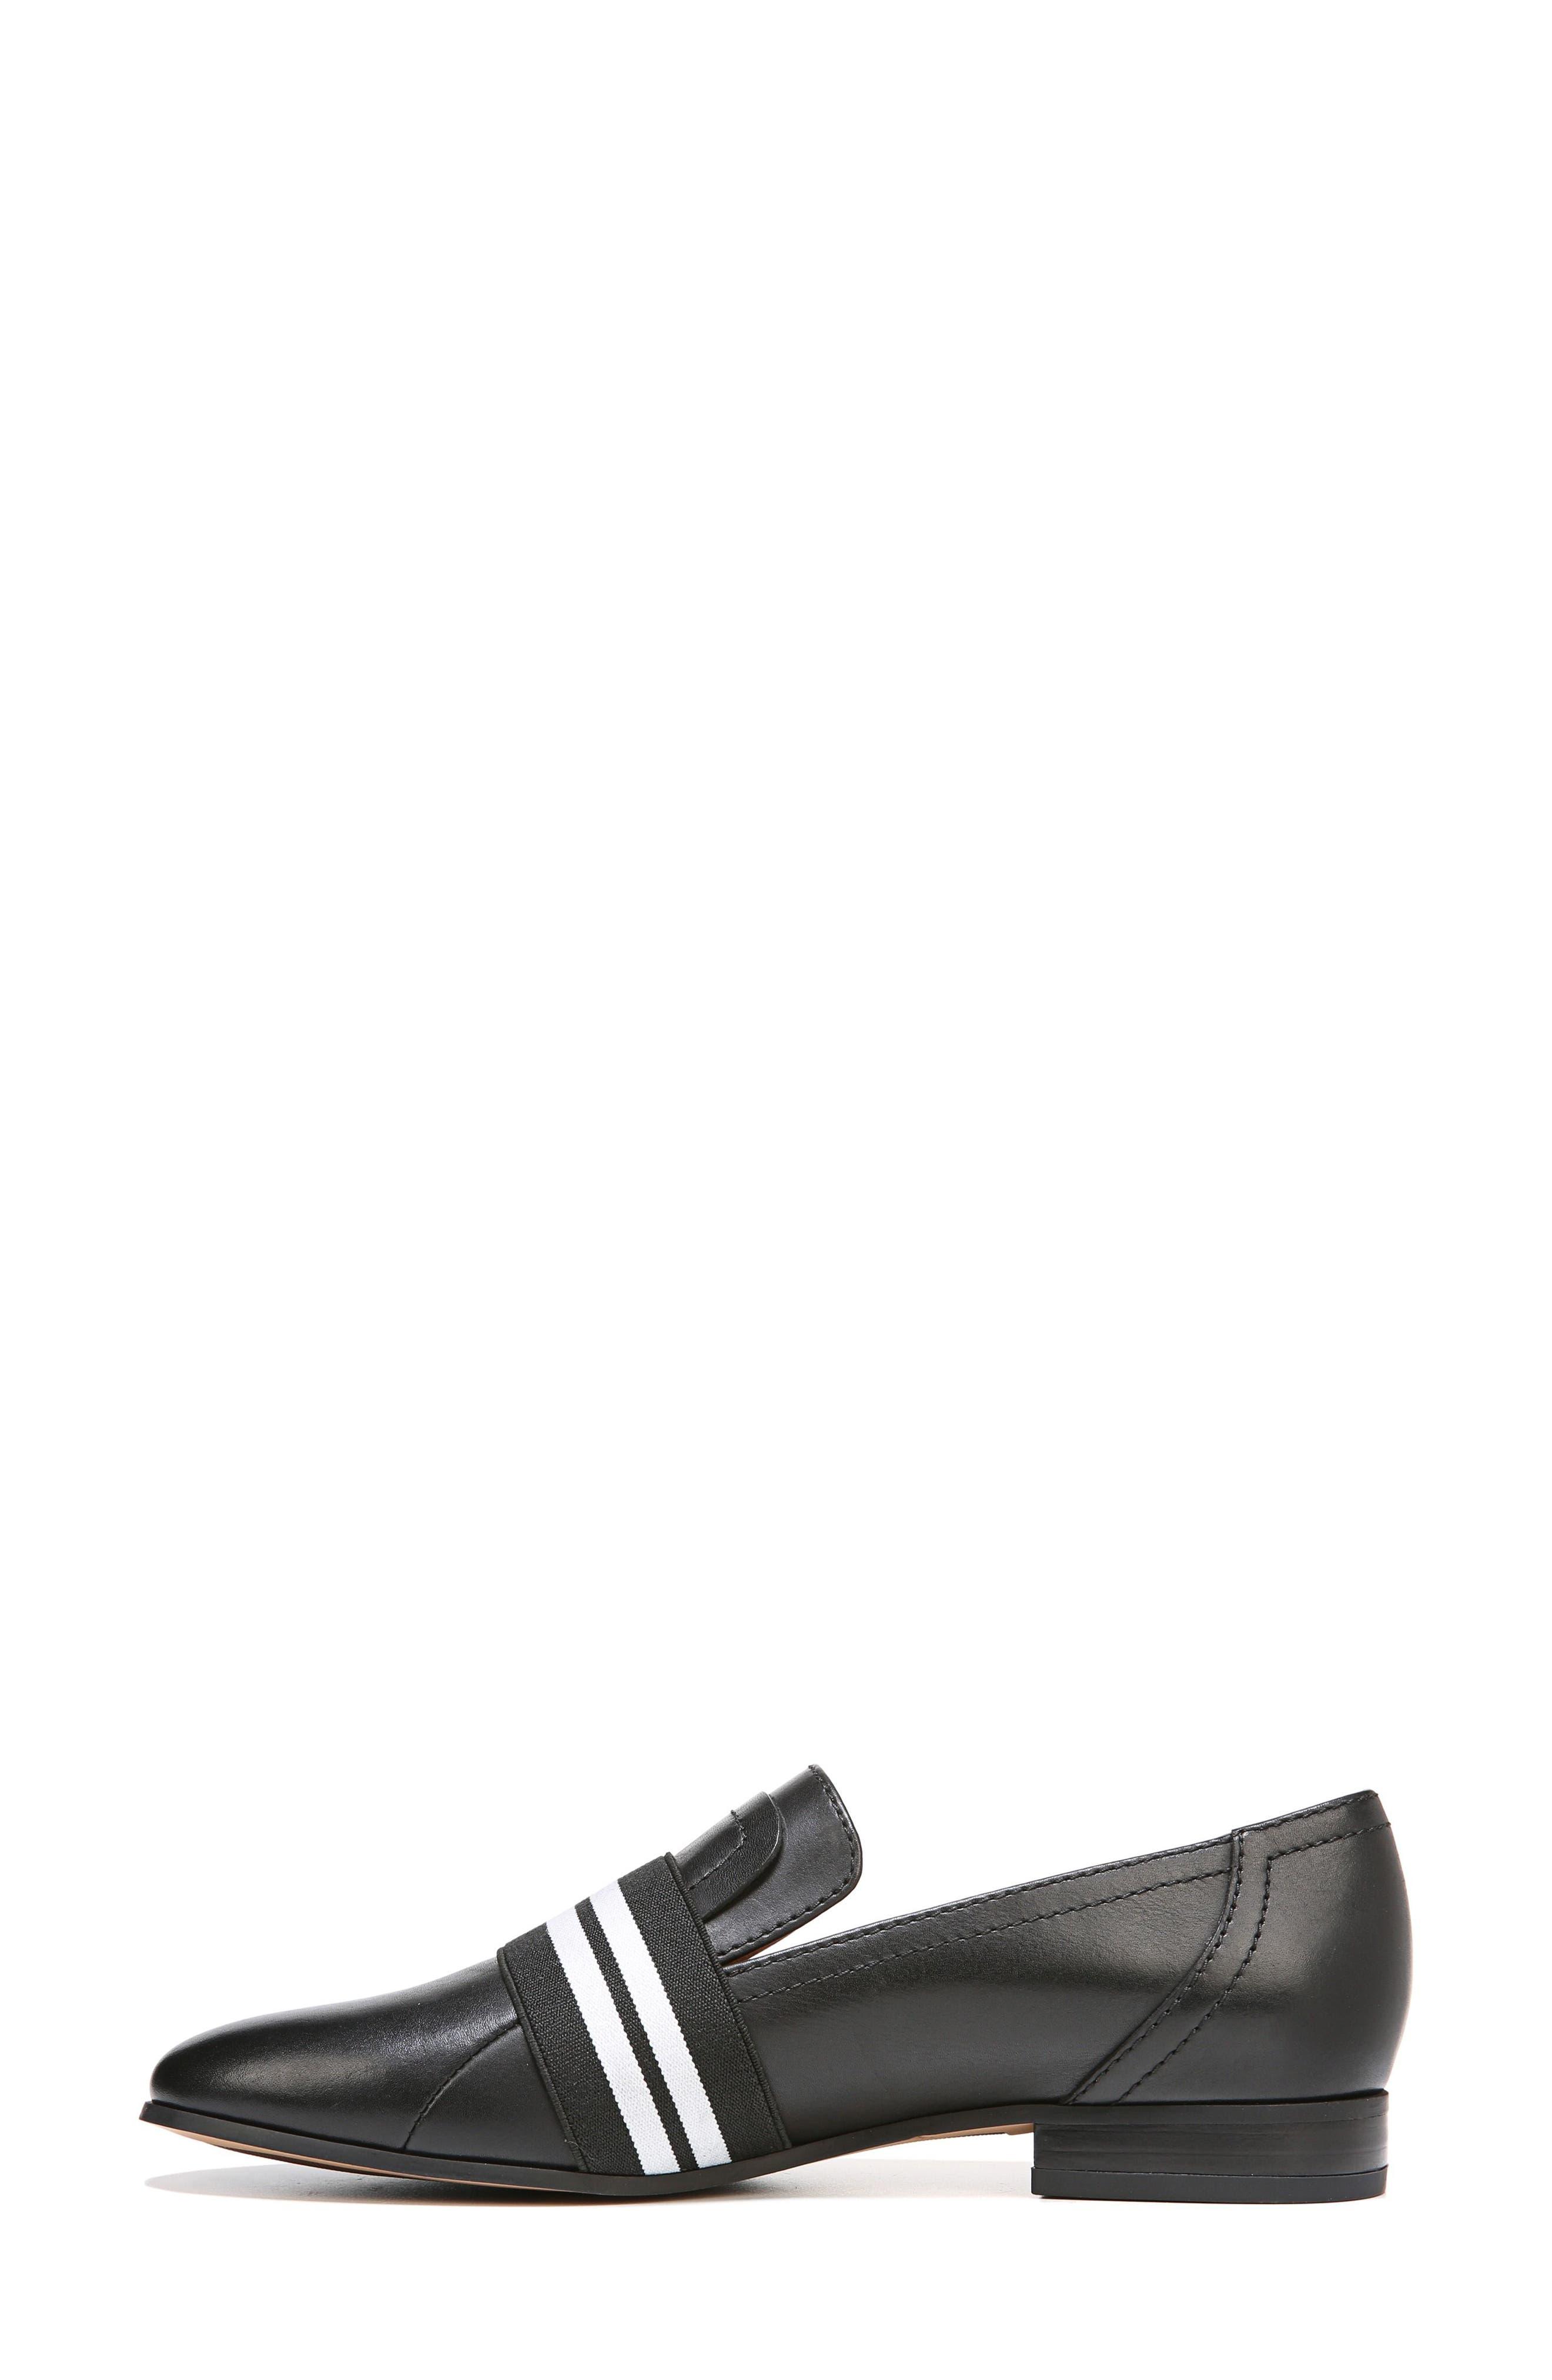 Odyssey Loafer,                             Alternate thumbnail 3, color,                             001